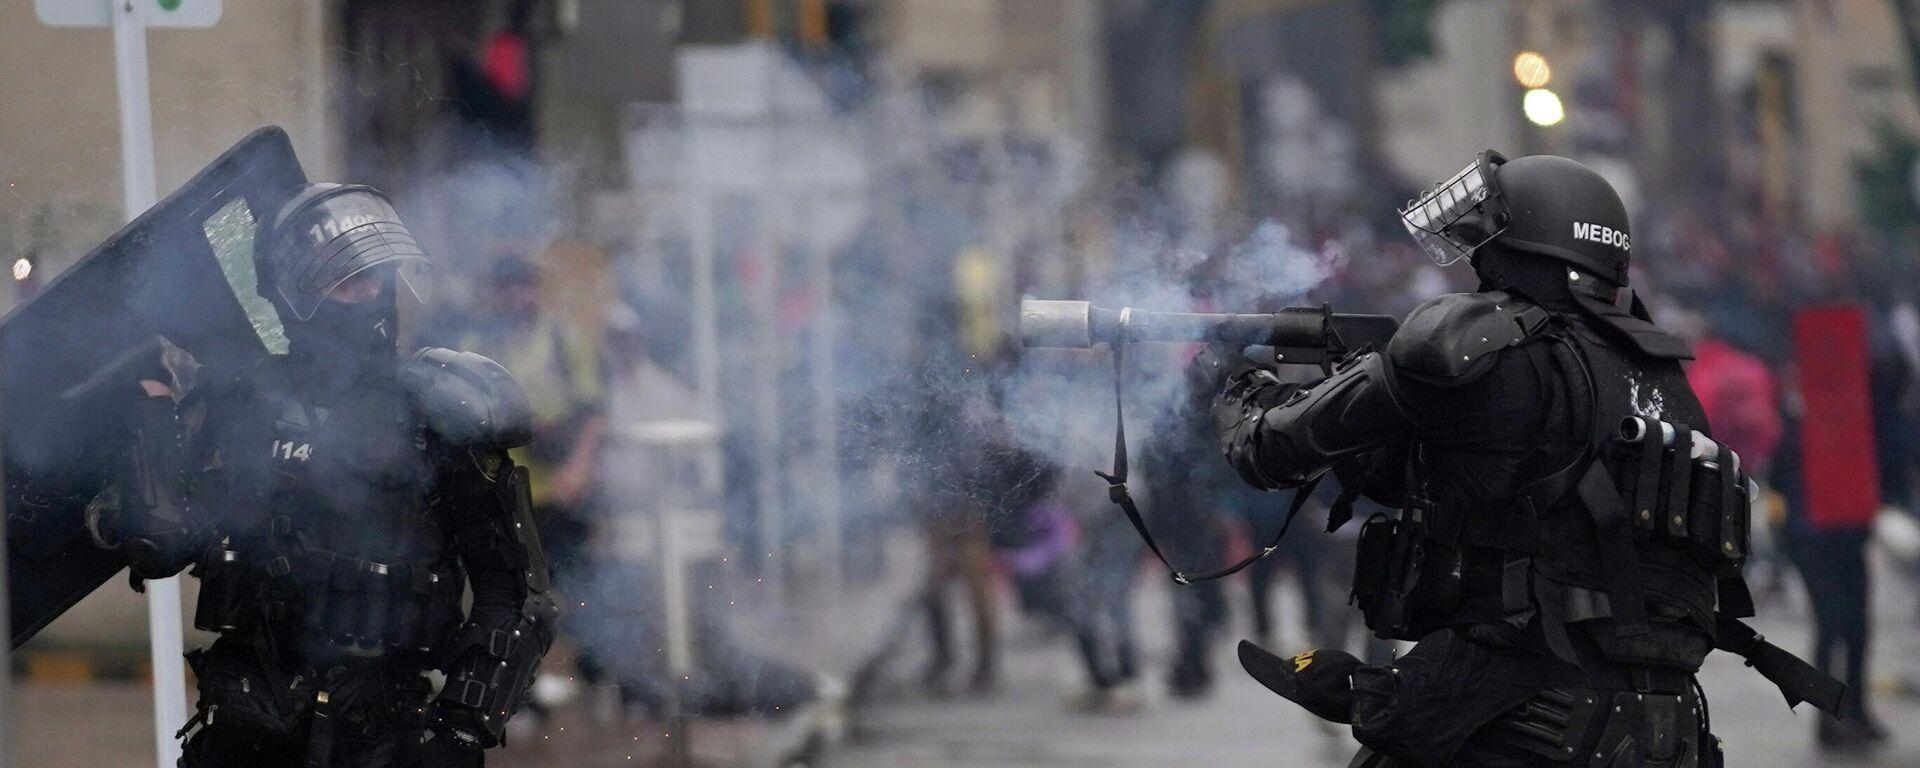 Protestas en Colombia - Sputnik Mundo, 1920, 07.05.2021